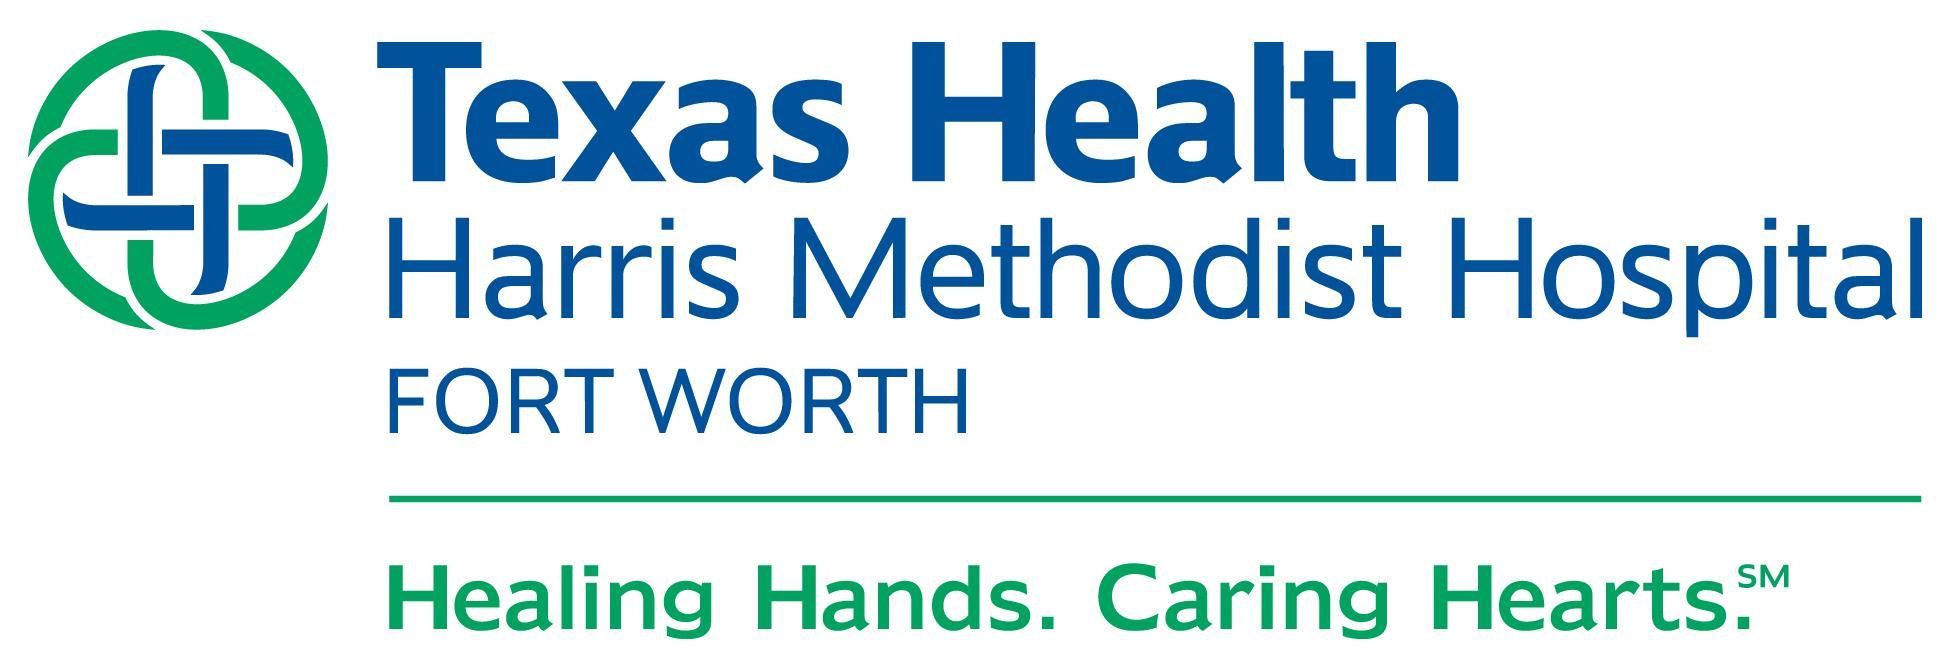 Seeking Stellar Neurosurgeons in Fort Worth, Texas - Texas Health Harris Methodist Fort Worth